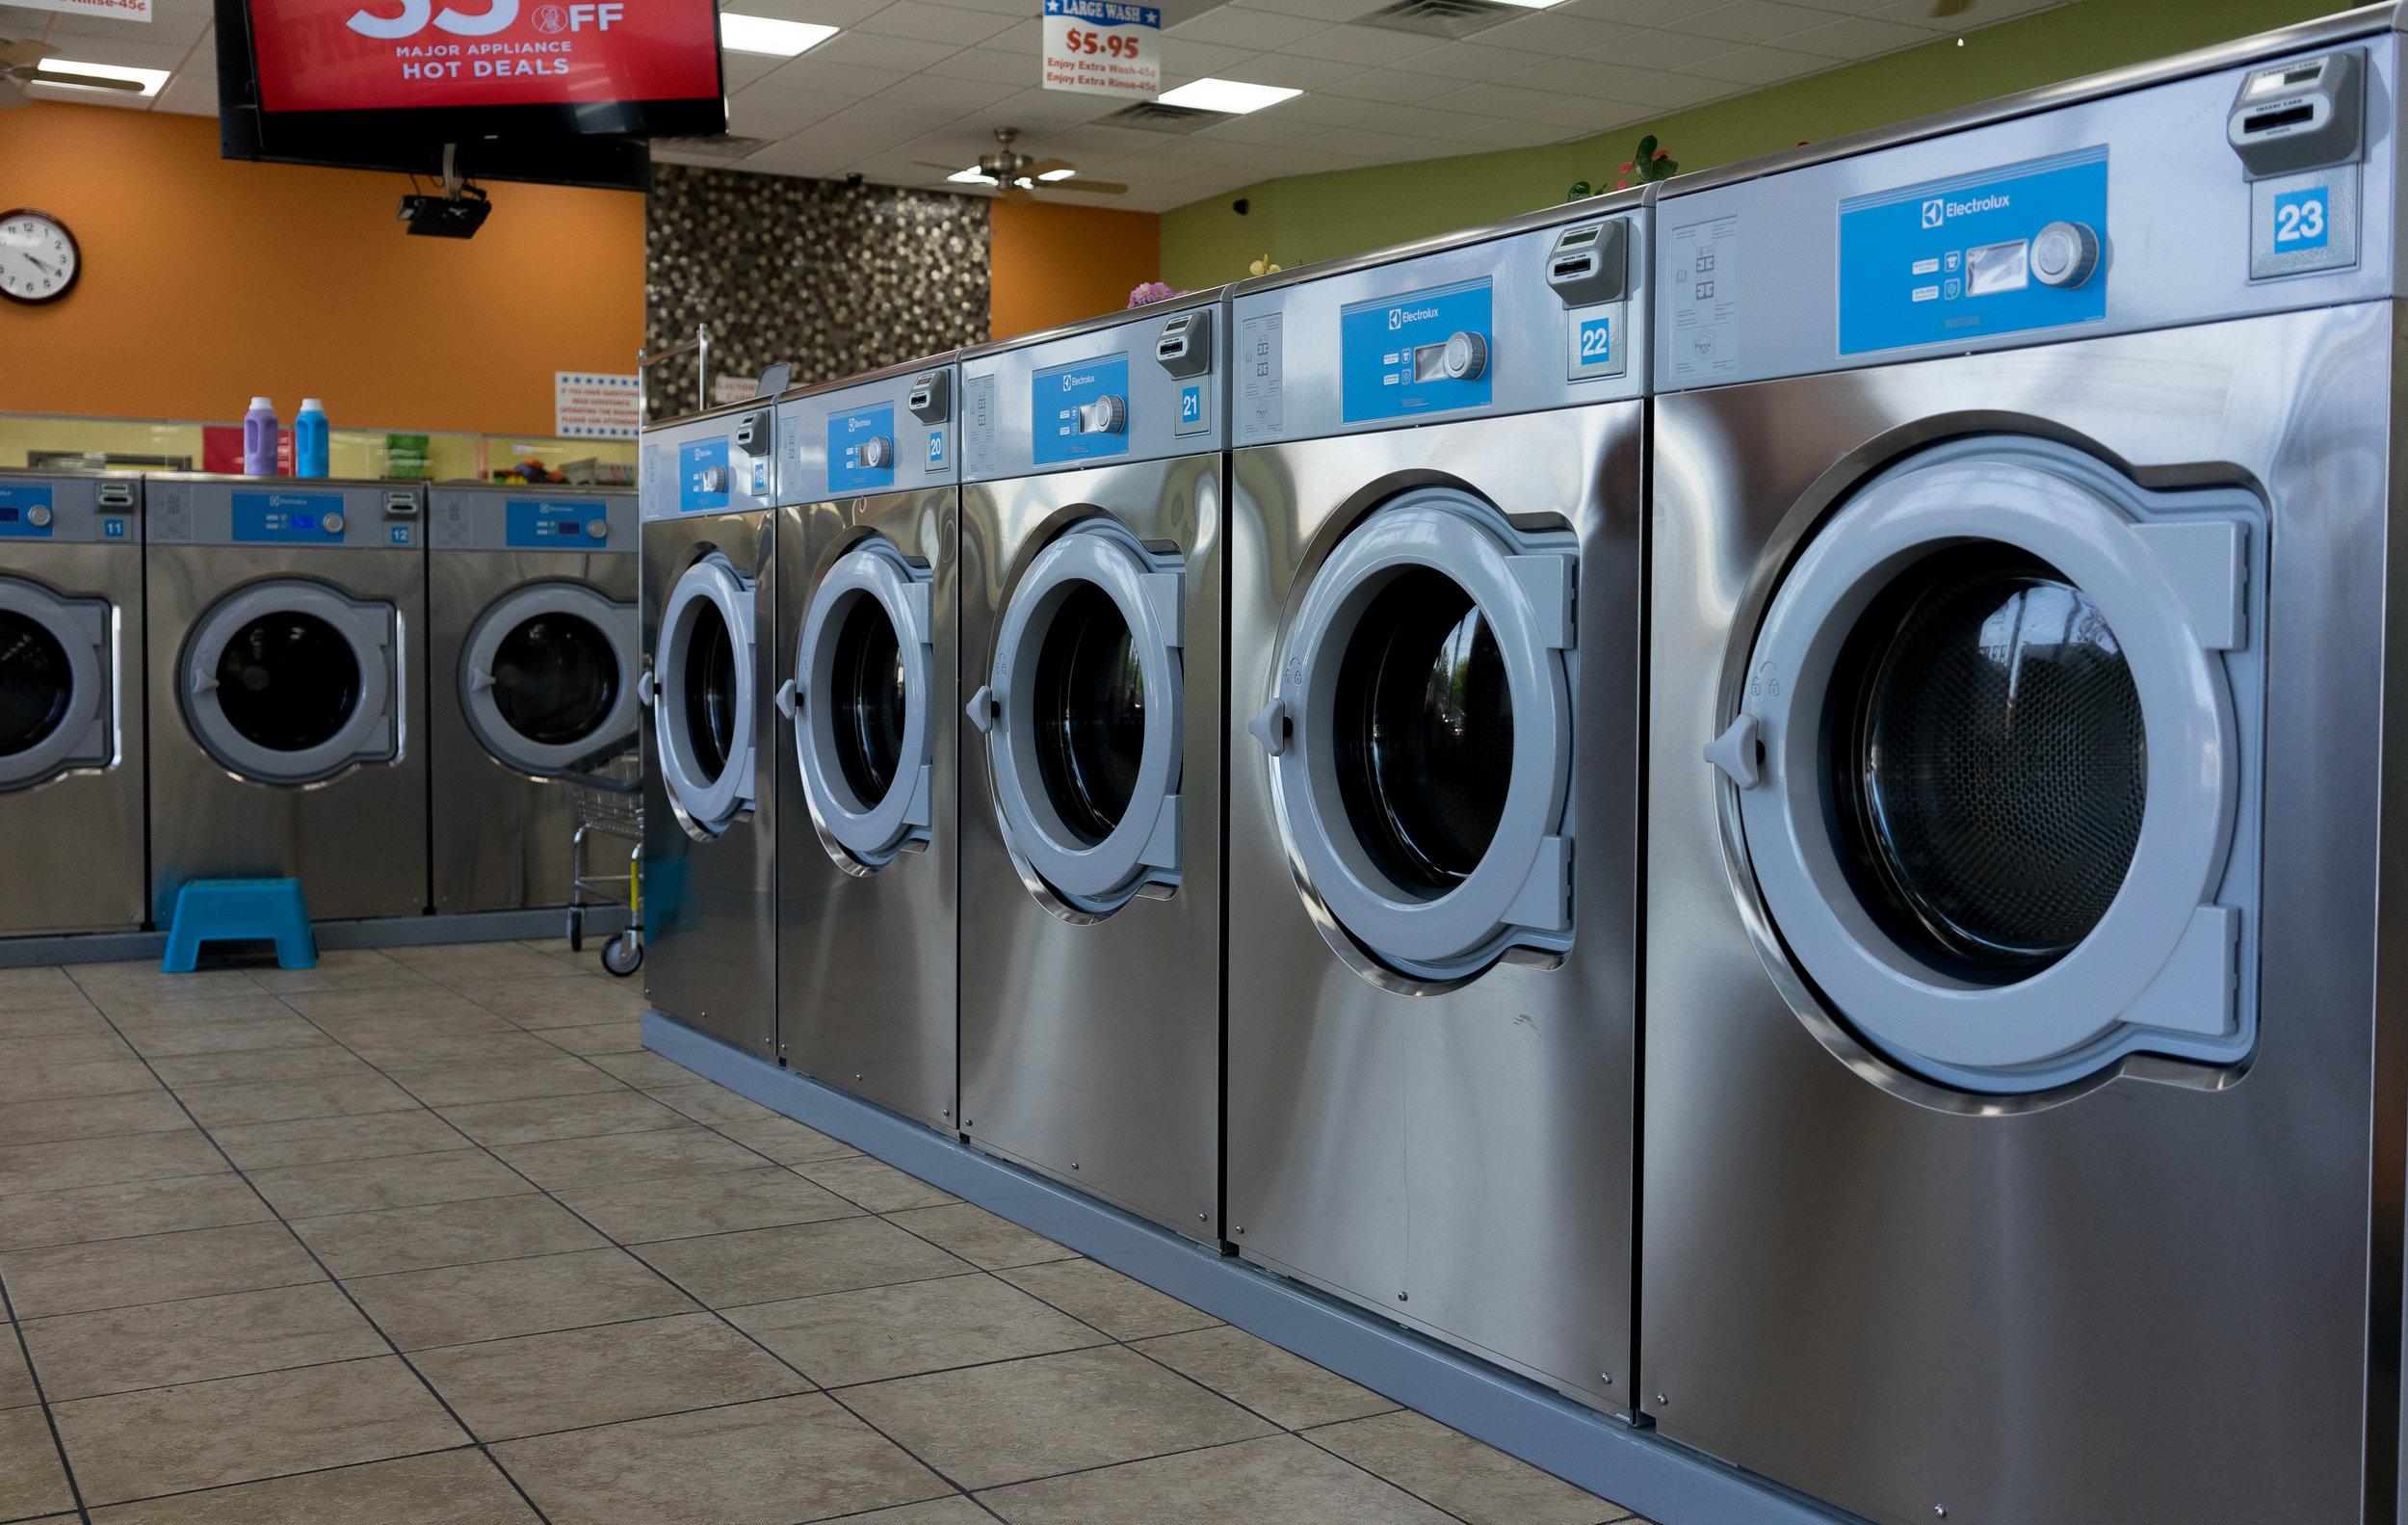 Jumbo laundromat jumbo laundry and dry cleaning solutioingenieria Images